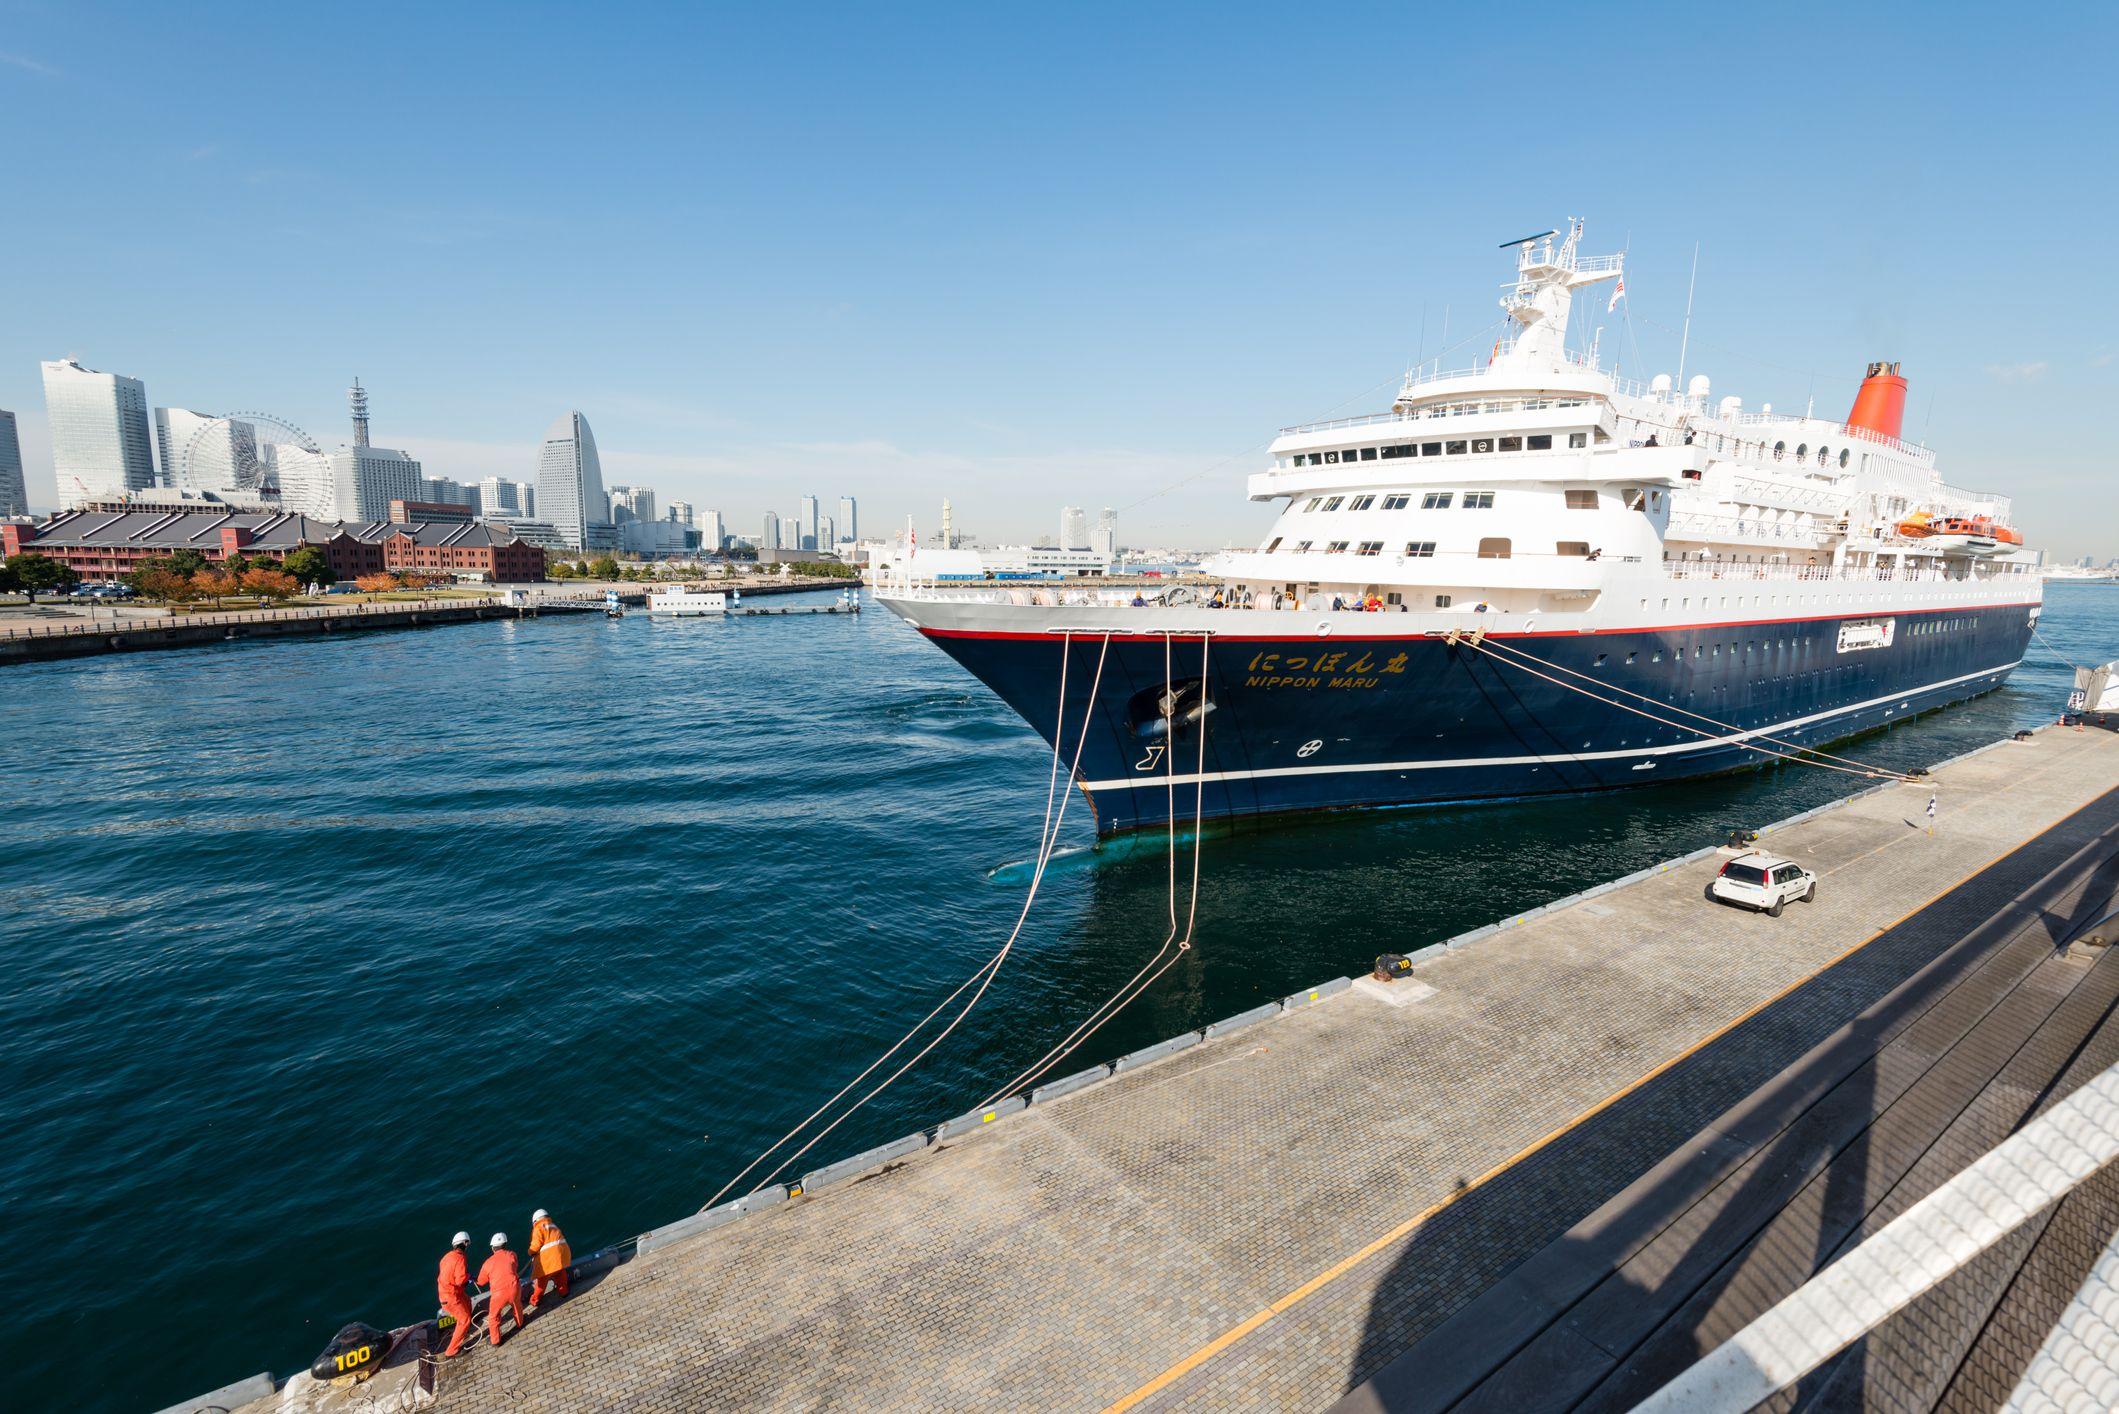 Cruise Ship, U.S. Navy, Cruise Ship Accident, Cruise Ship Crash, Japan